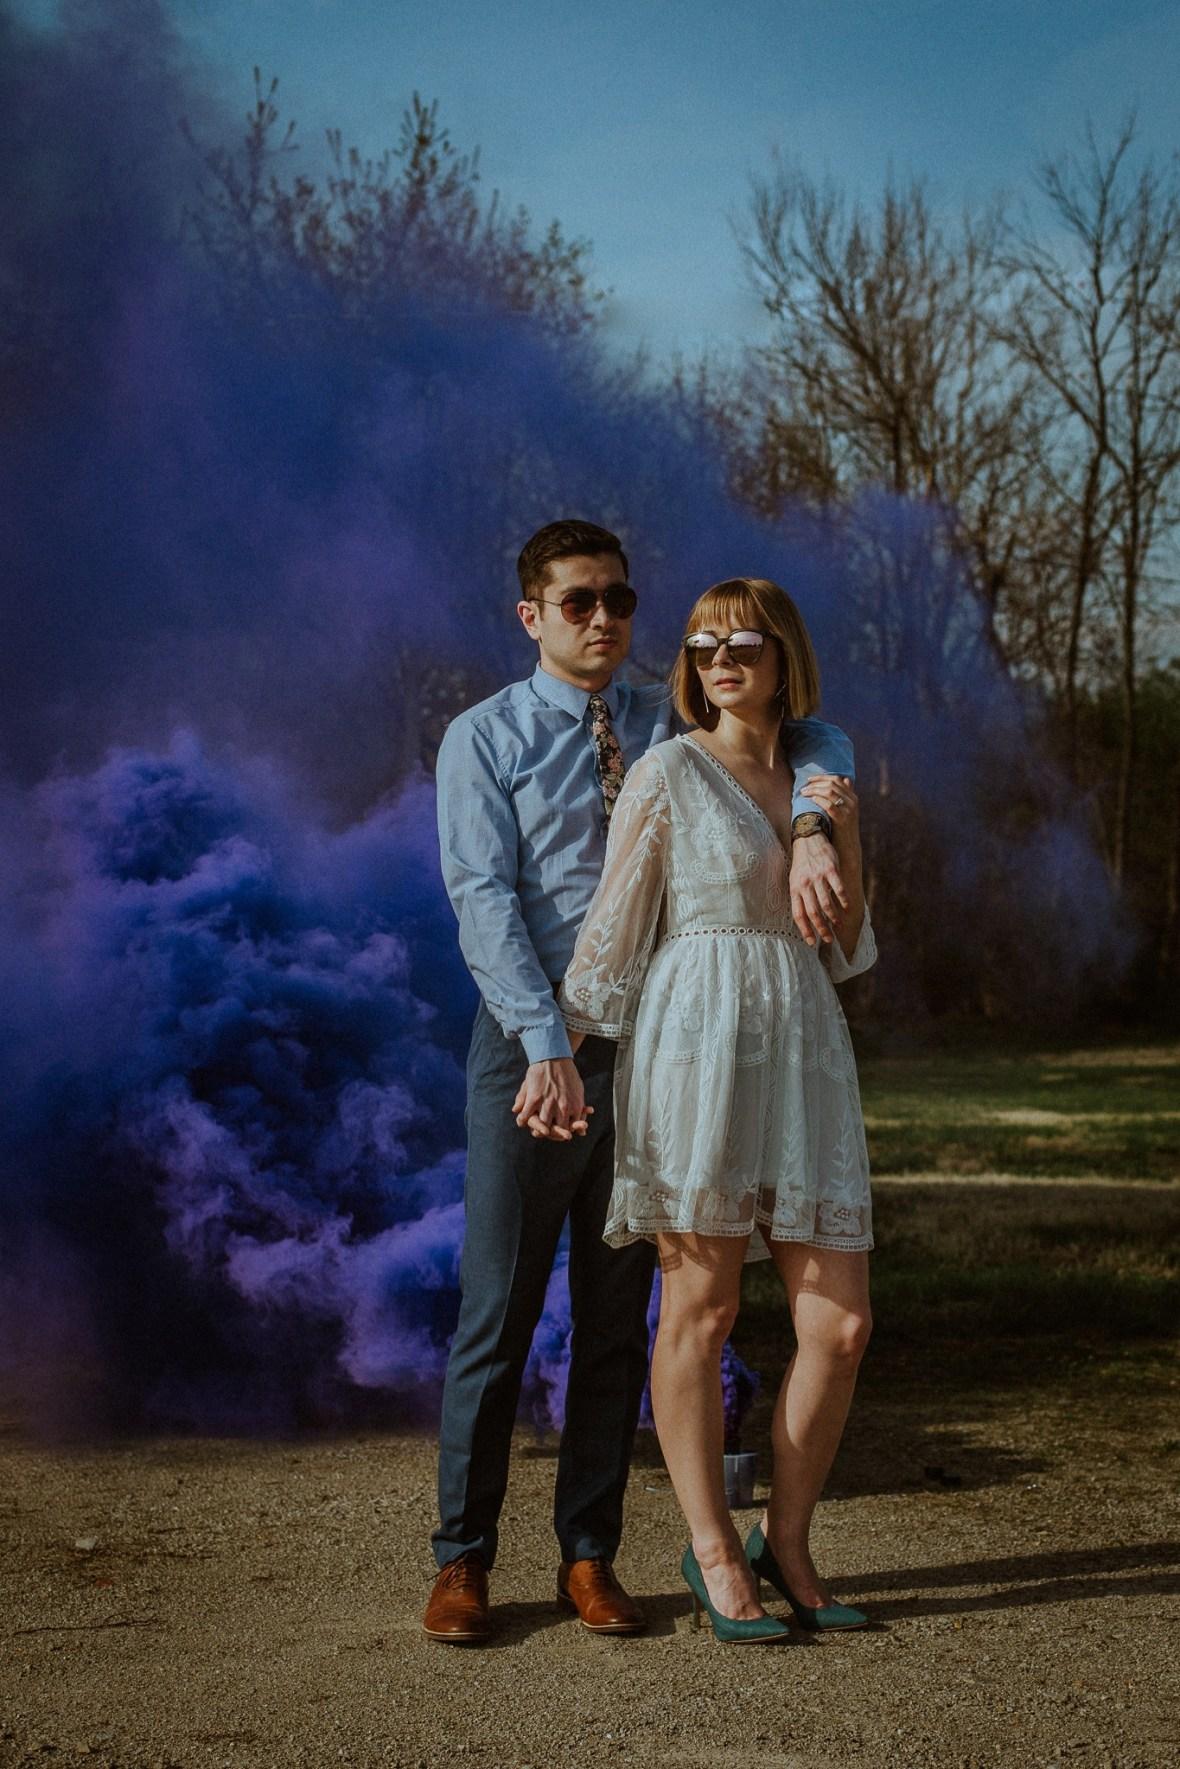 27_WTCM9987ab_Photos_Louisville_Center_Engagement_Kentucky_Smoke_Art_Bombs_Urban_Mellwood